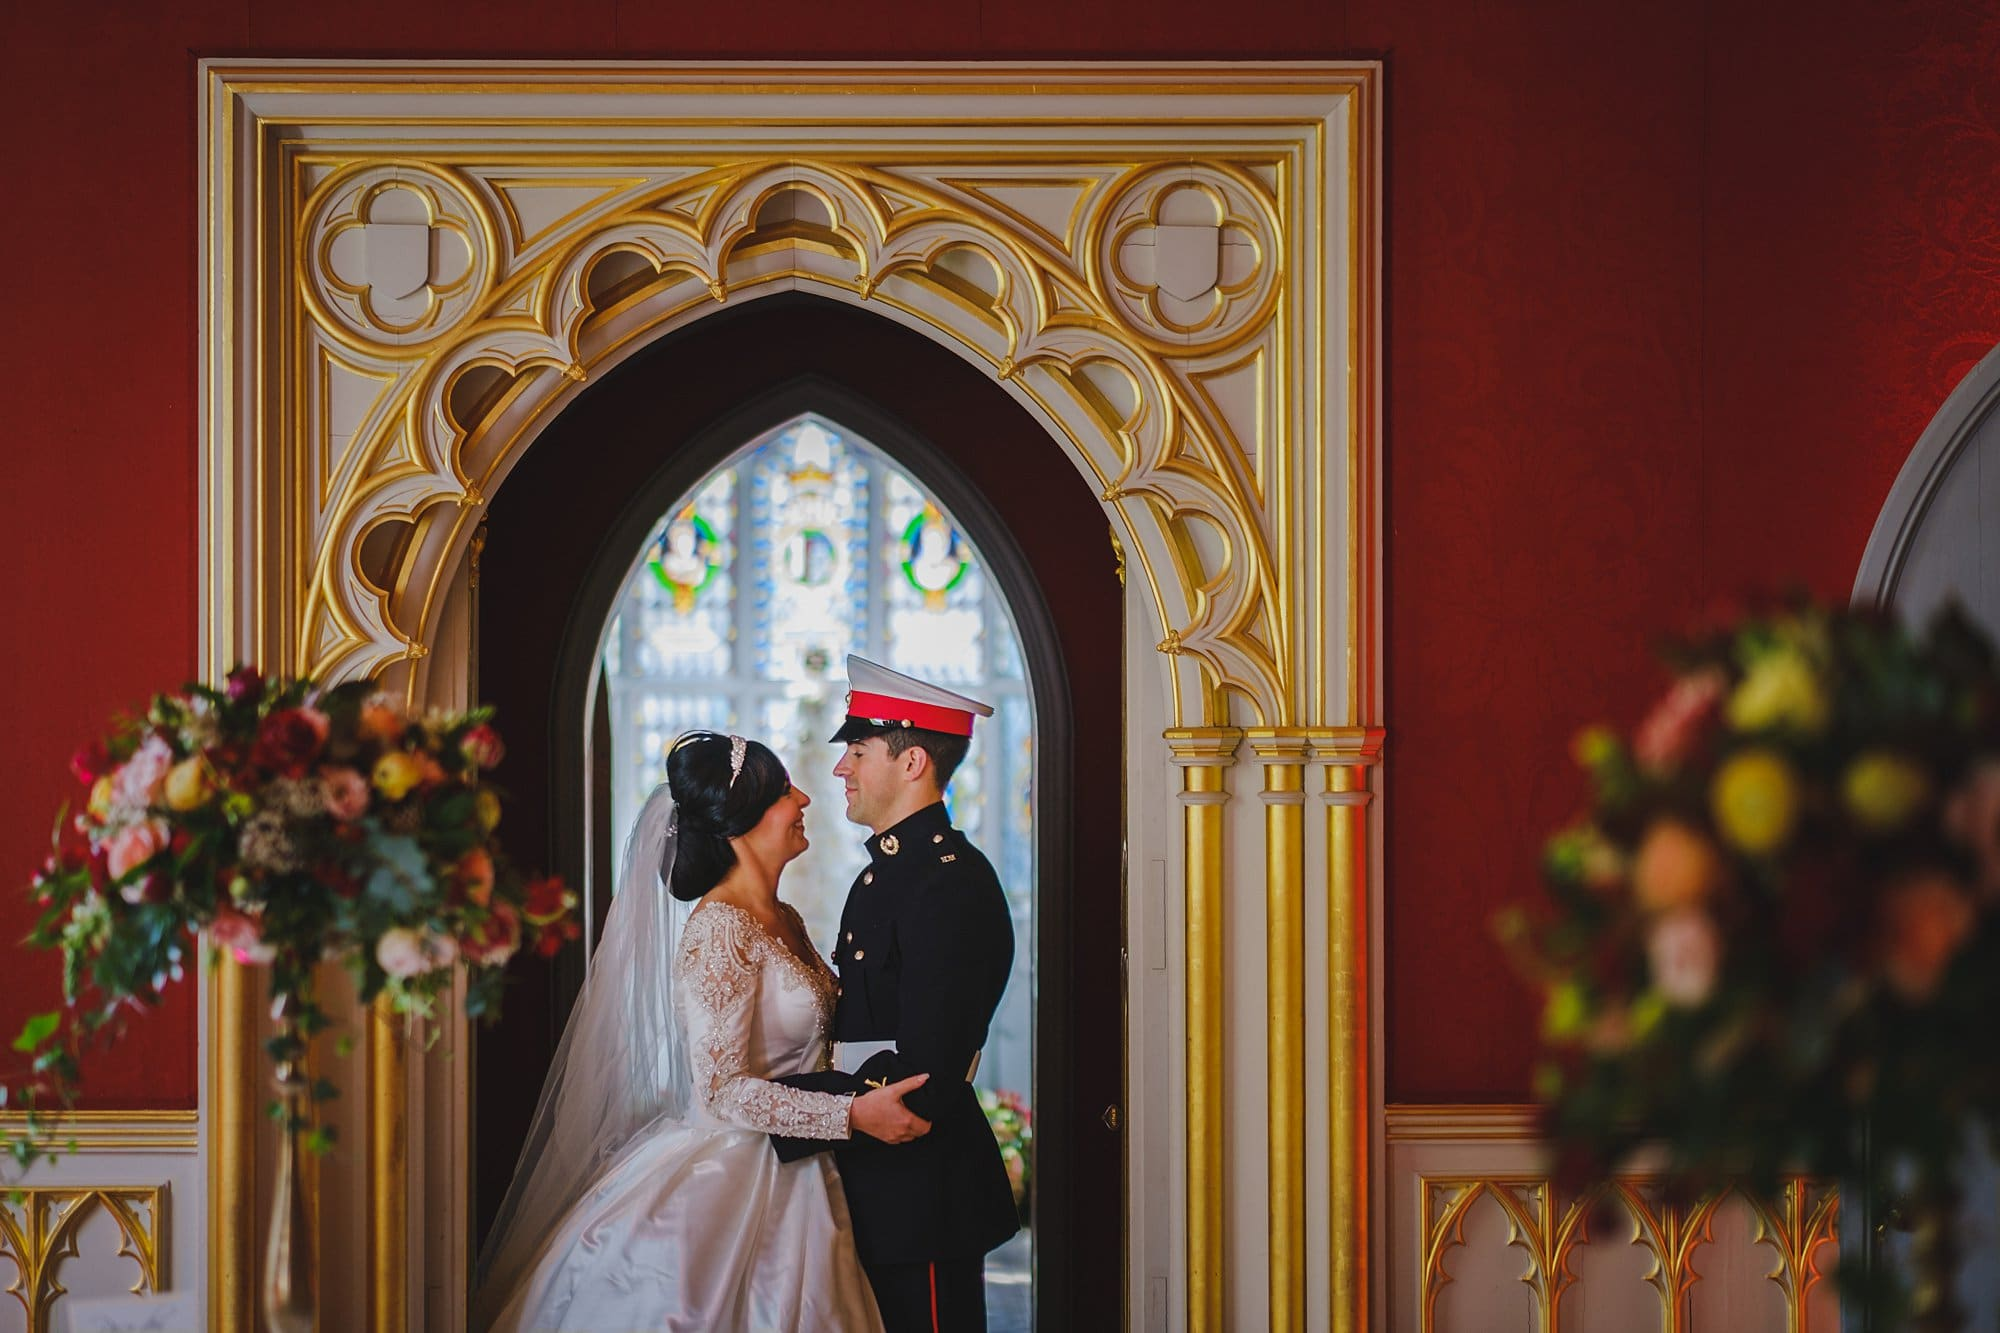 strawberry hill house wedding photographer cc 055 - Strawberry Hill House Wedding Photographer | Charlotte + Cristiano